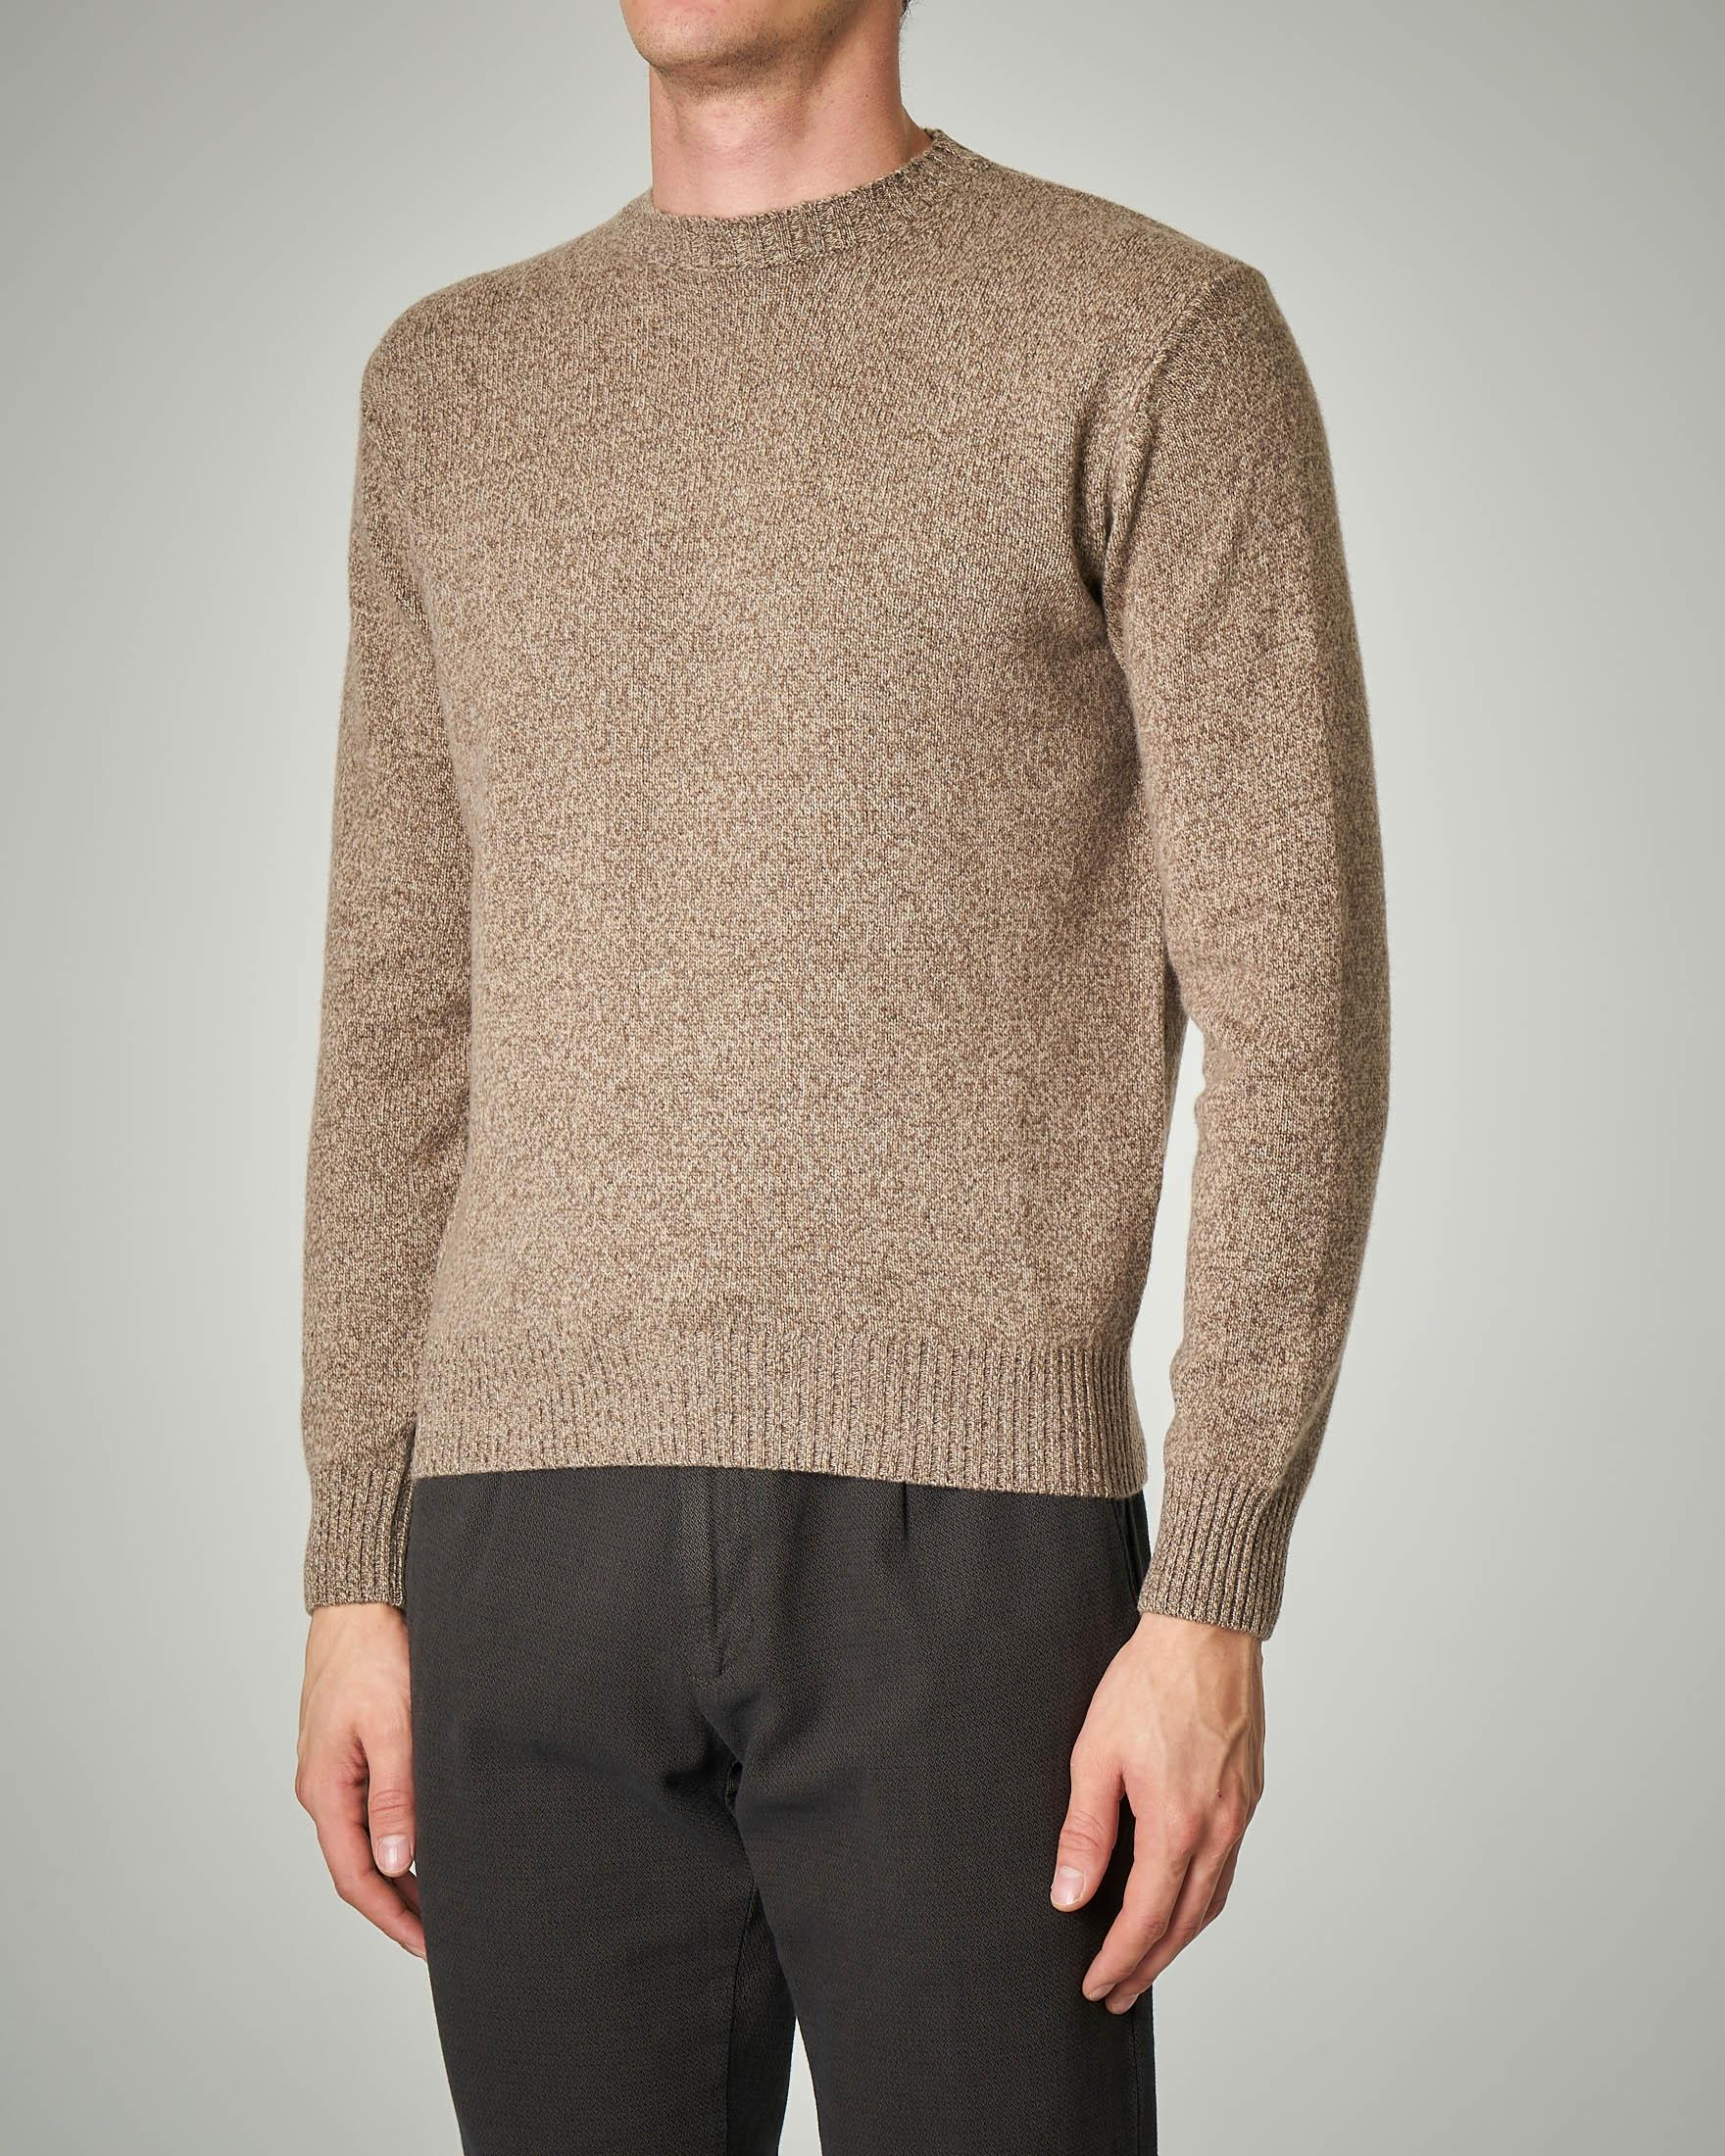 Maglia tortora moulinè in lana e cachemire finezza 7